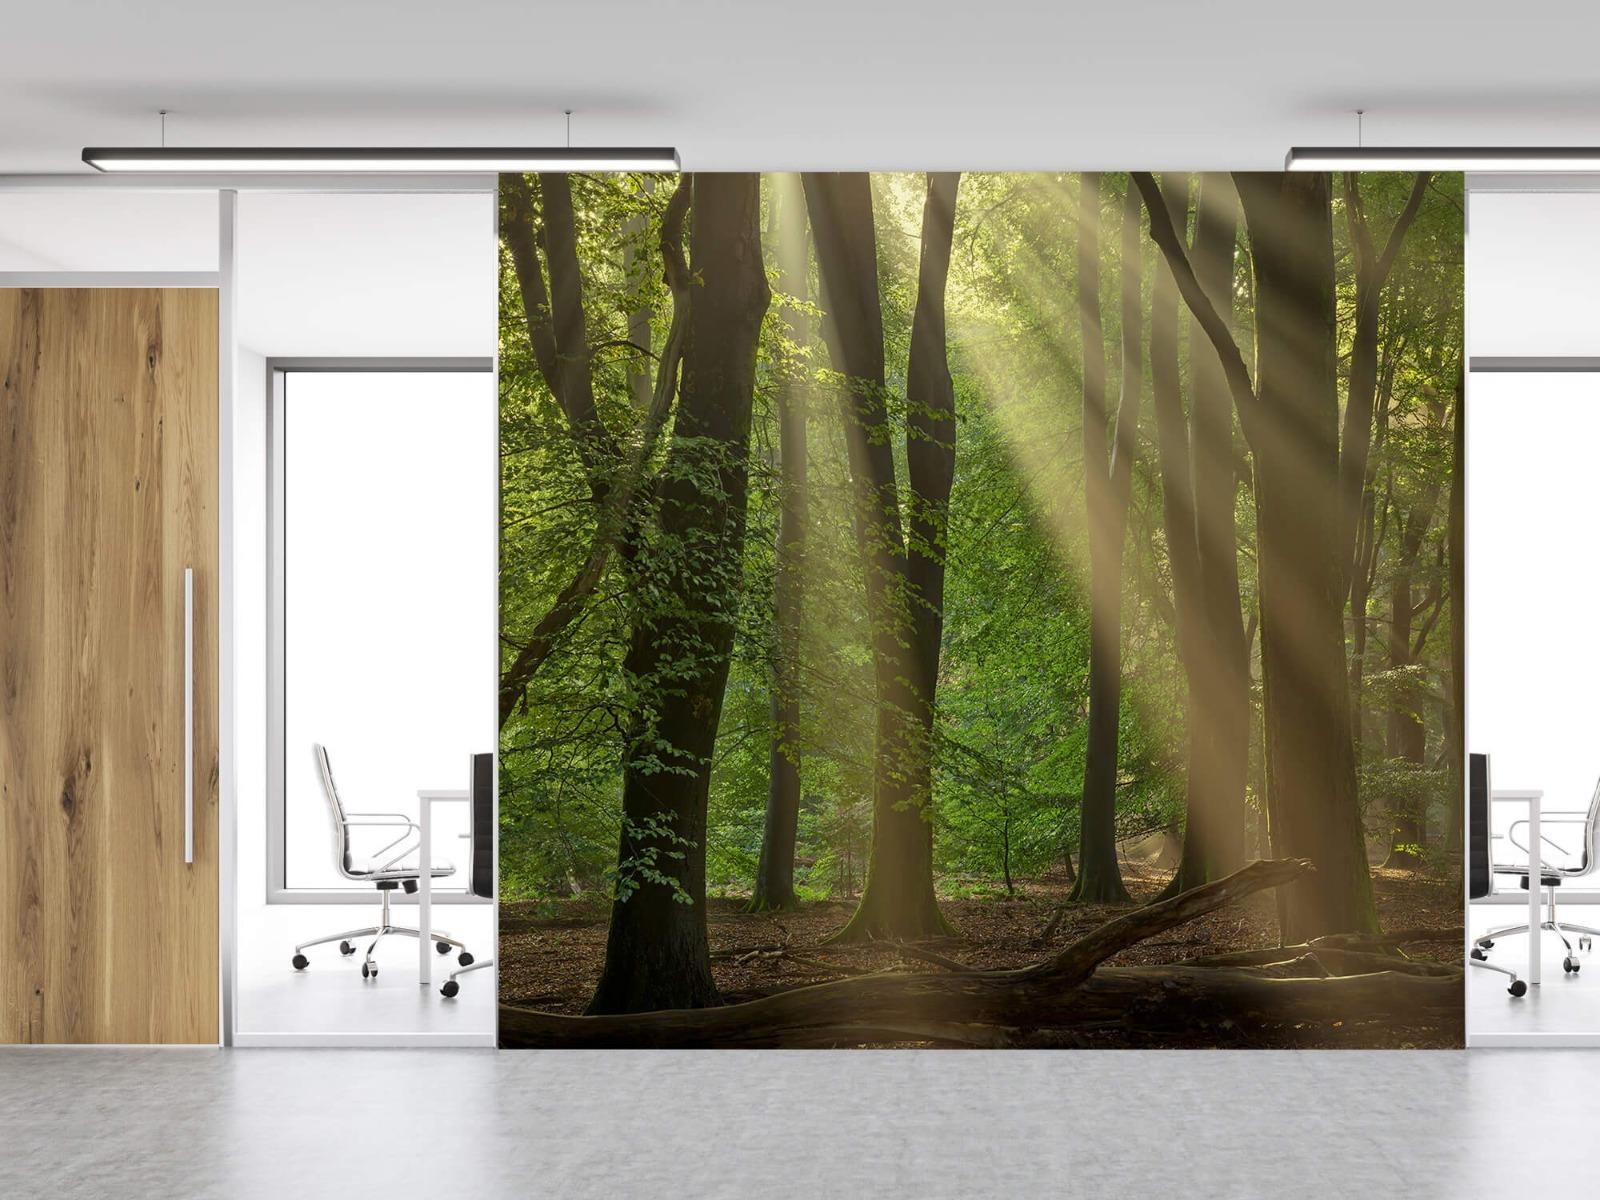 Bomen - Zonneharpen in het bos - Slaapkamer 13